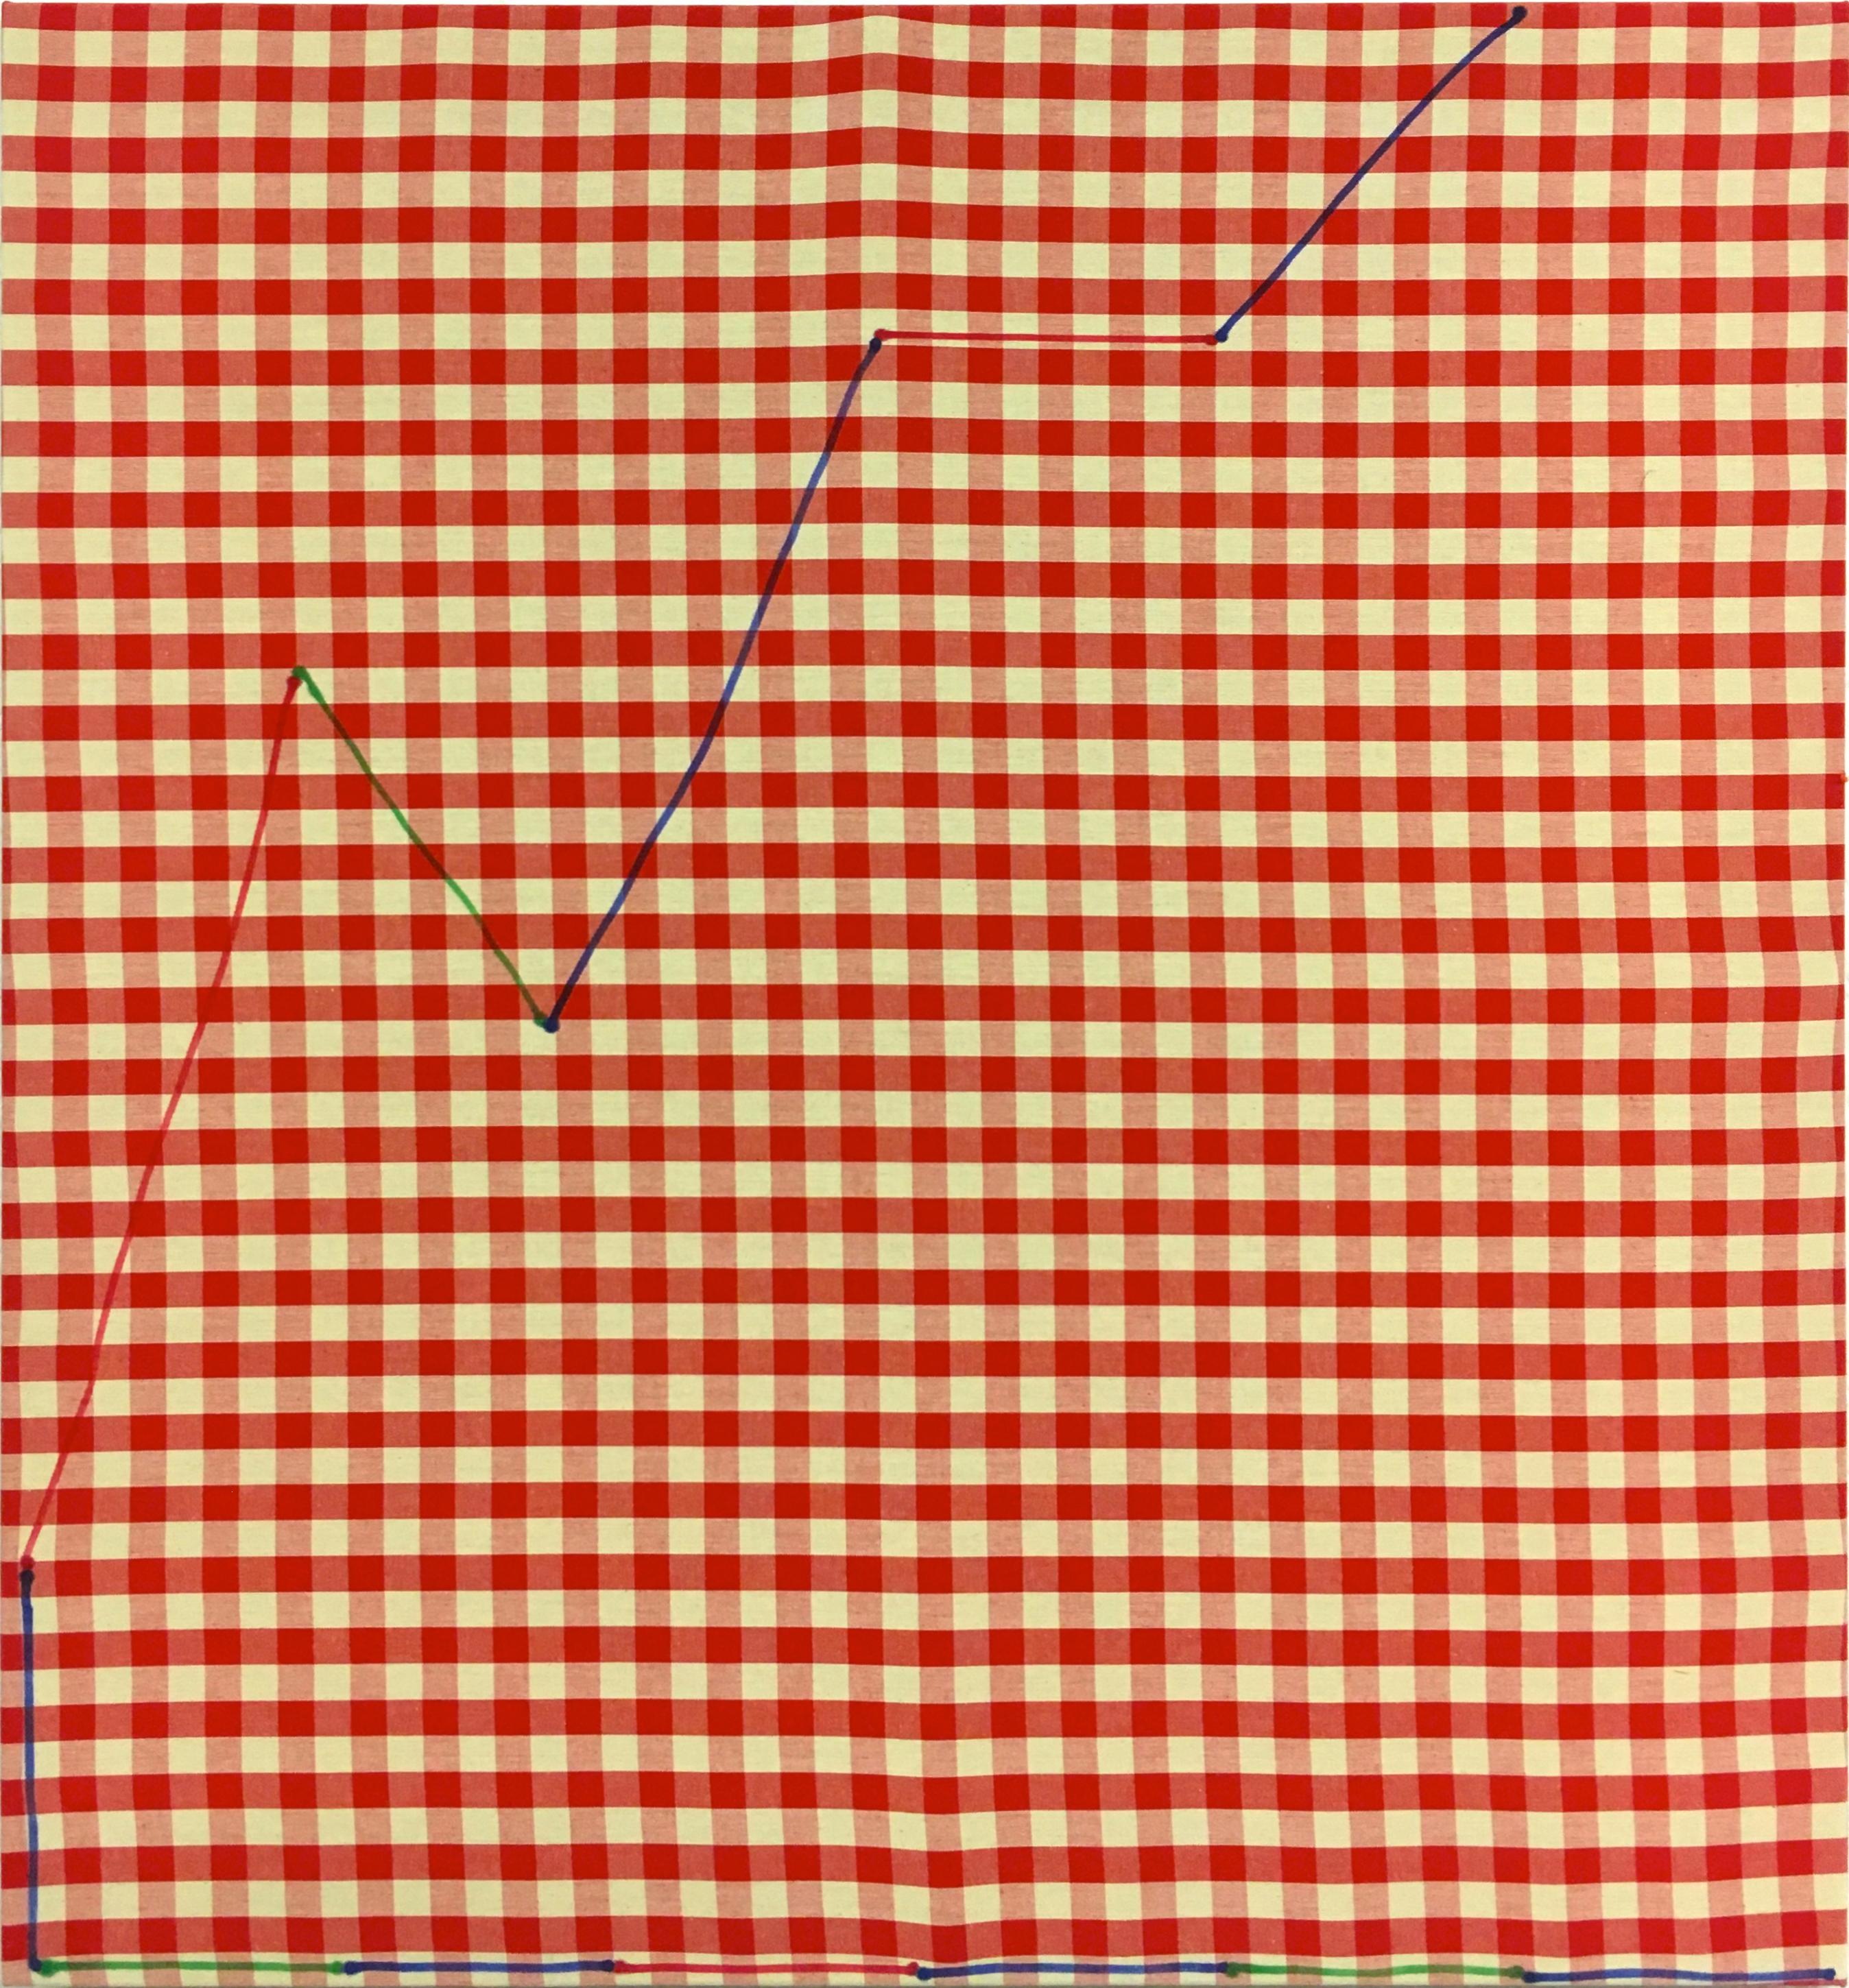 12:13 D Oleksiy Koval, 2019 Marker on cotton, 89 x 83 cm